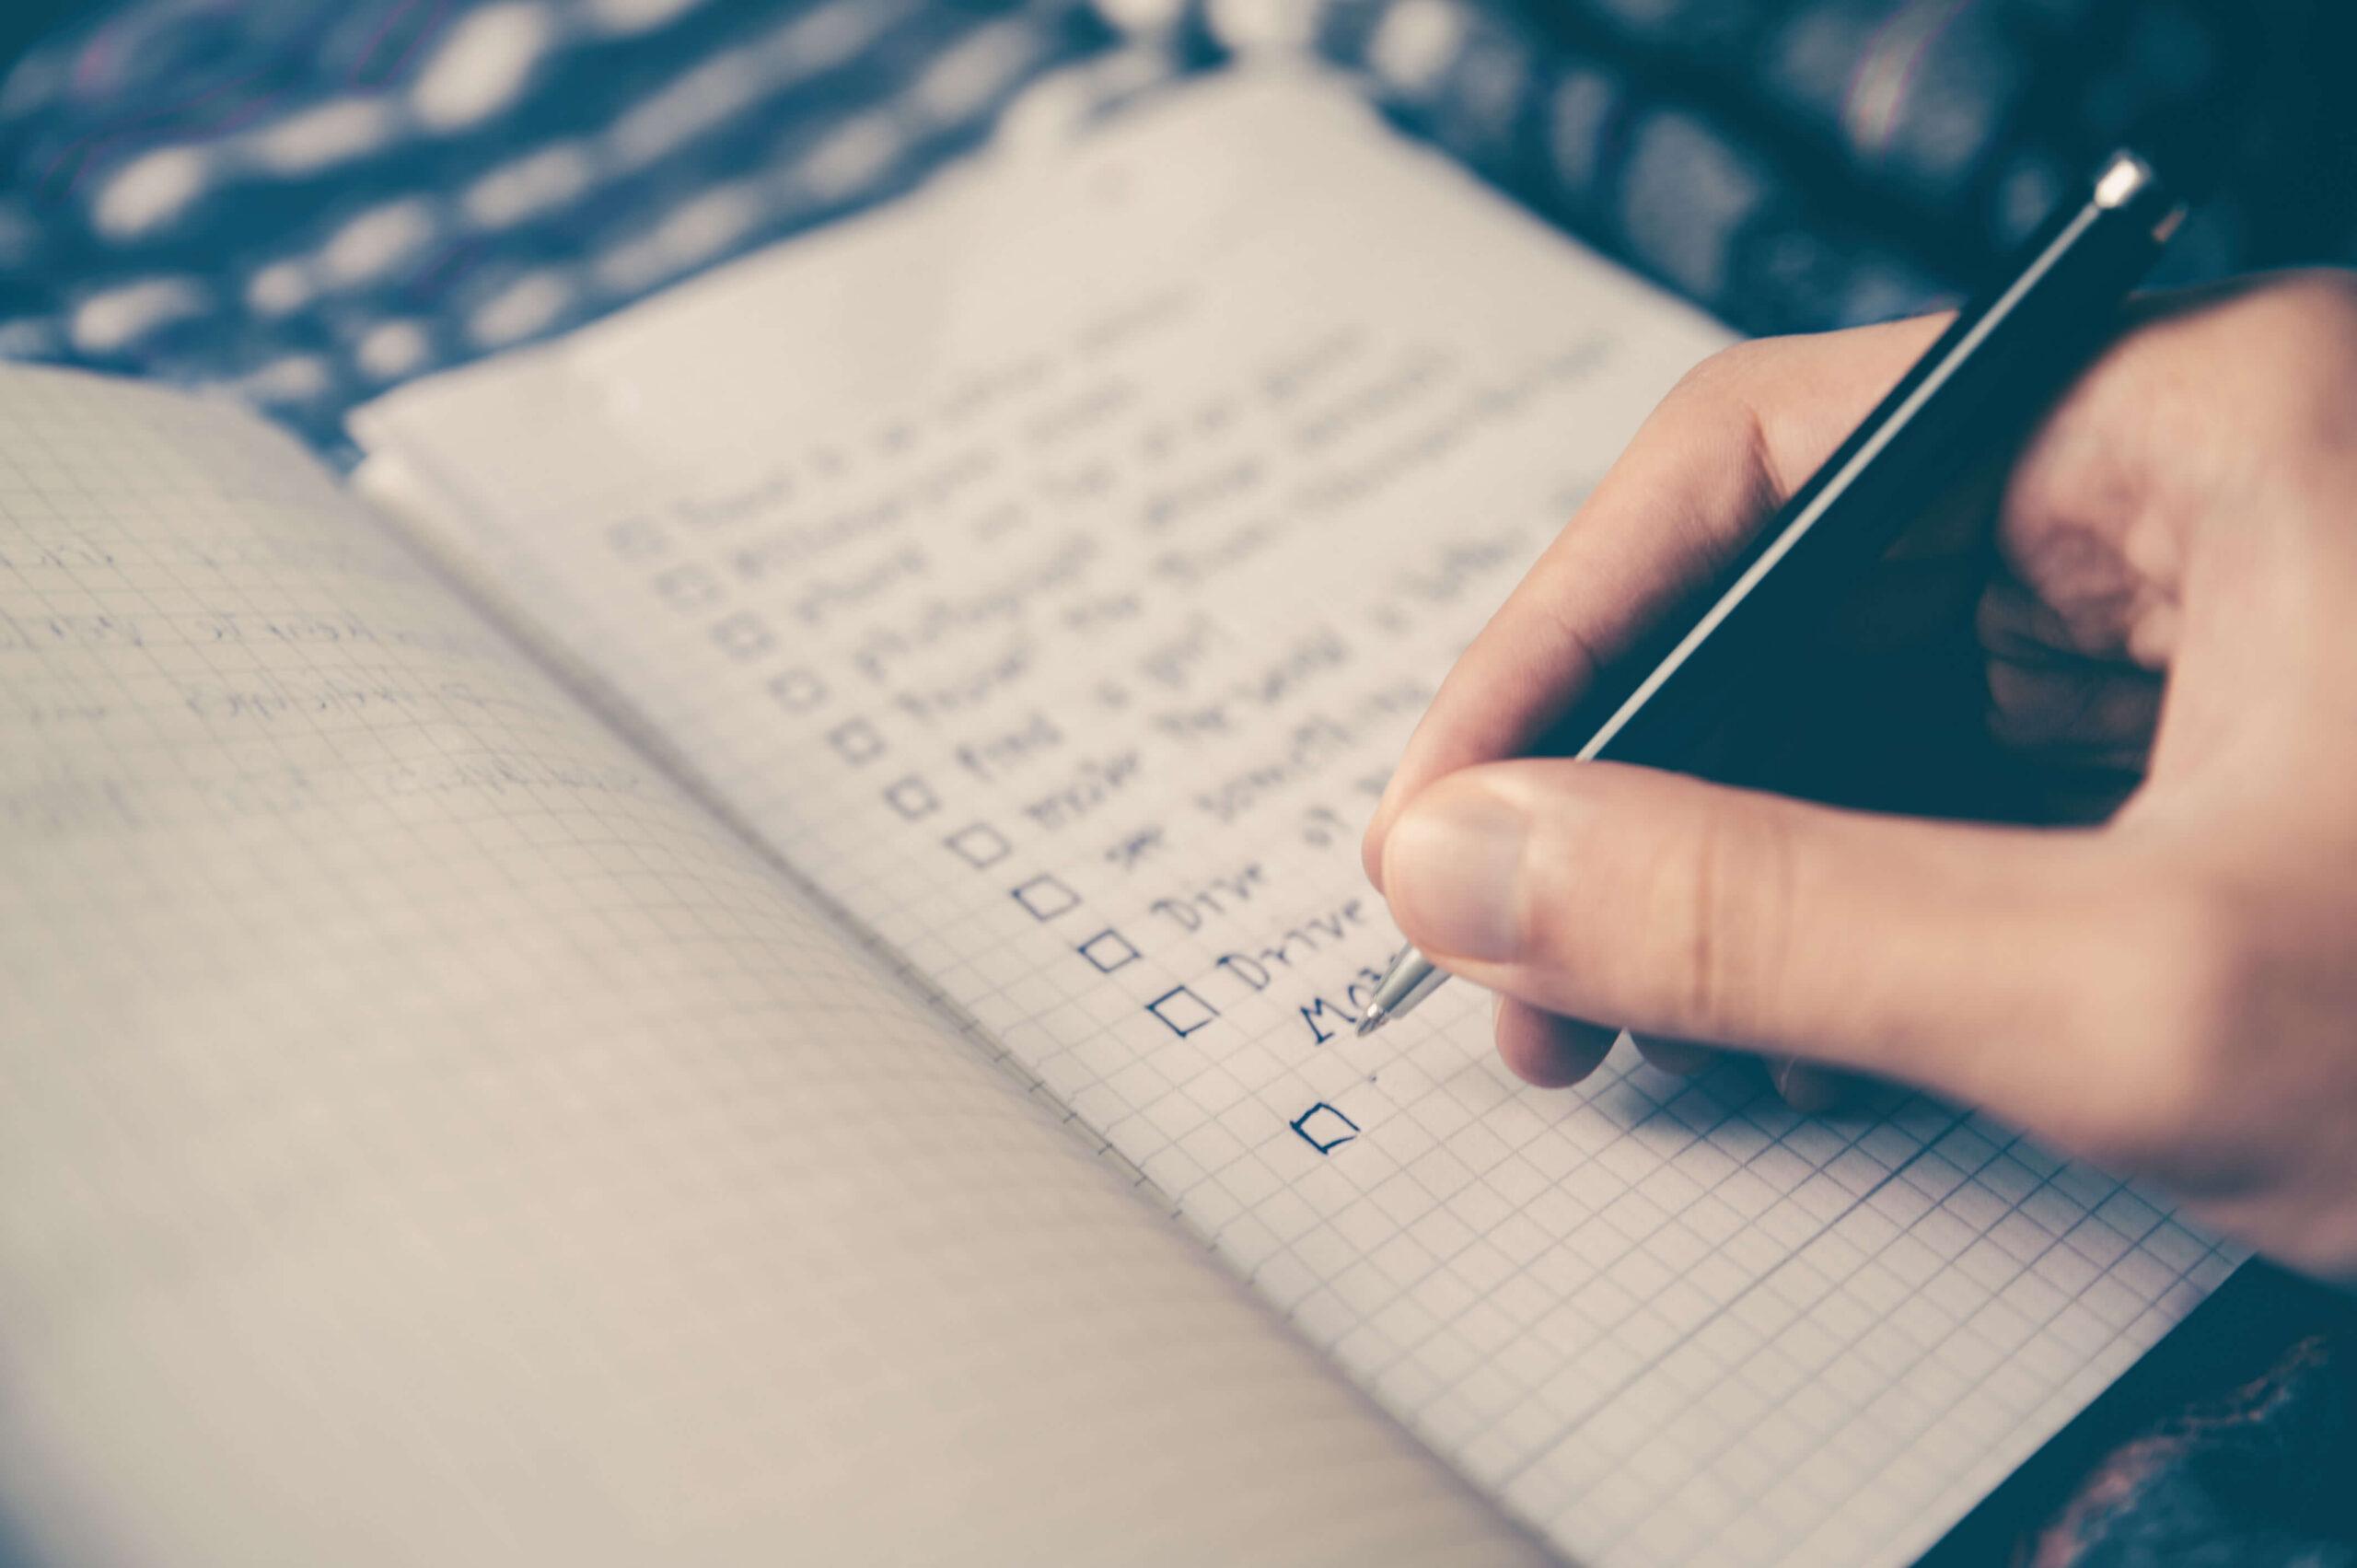 Vrouw vult checklist in